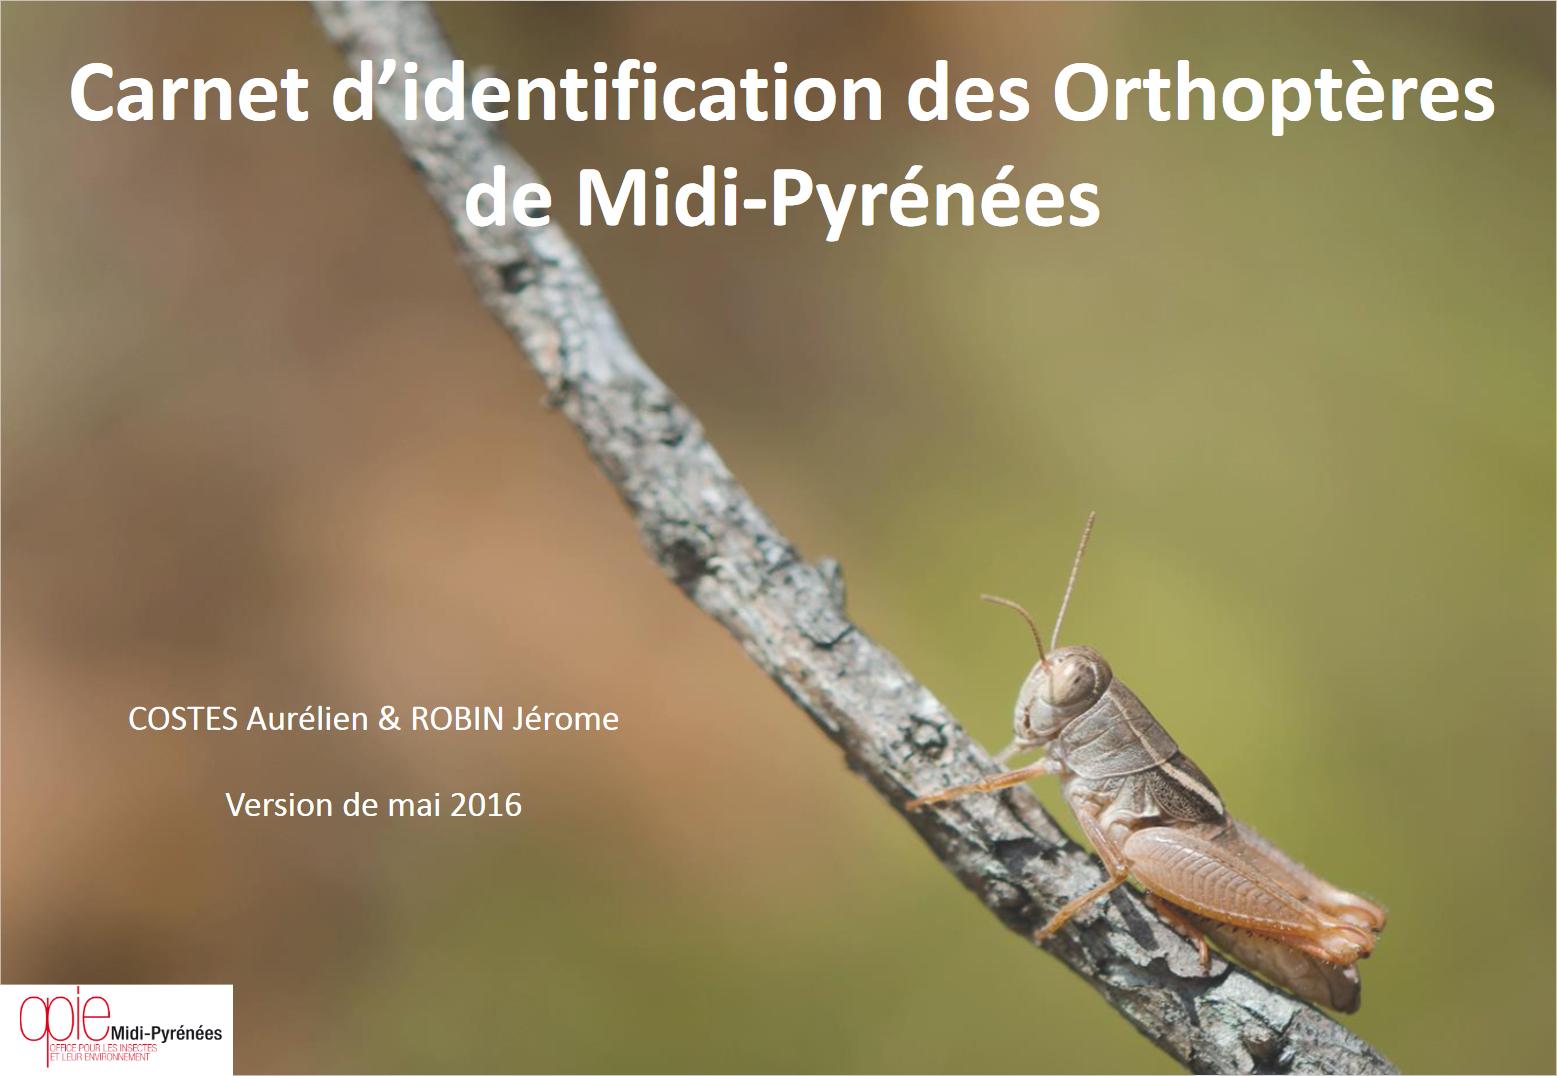 https://cdnfiles2.biolovision.net/www.faune-tarn-aveyron.org/userfiles/page5.jpg